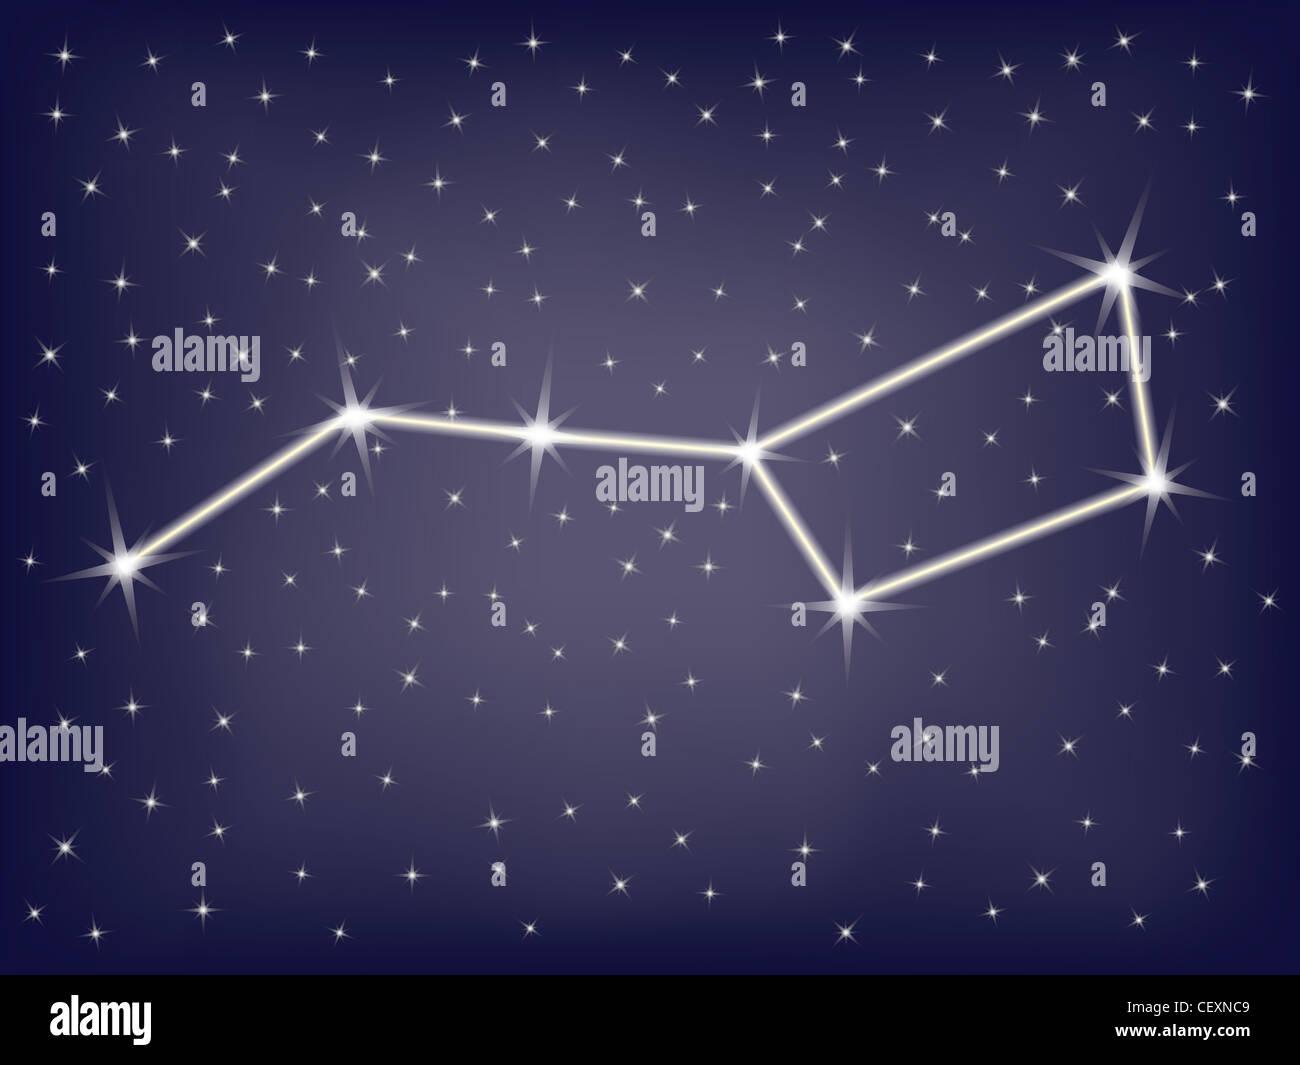 Ковш созвездия своими руками